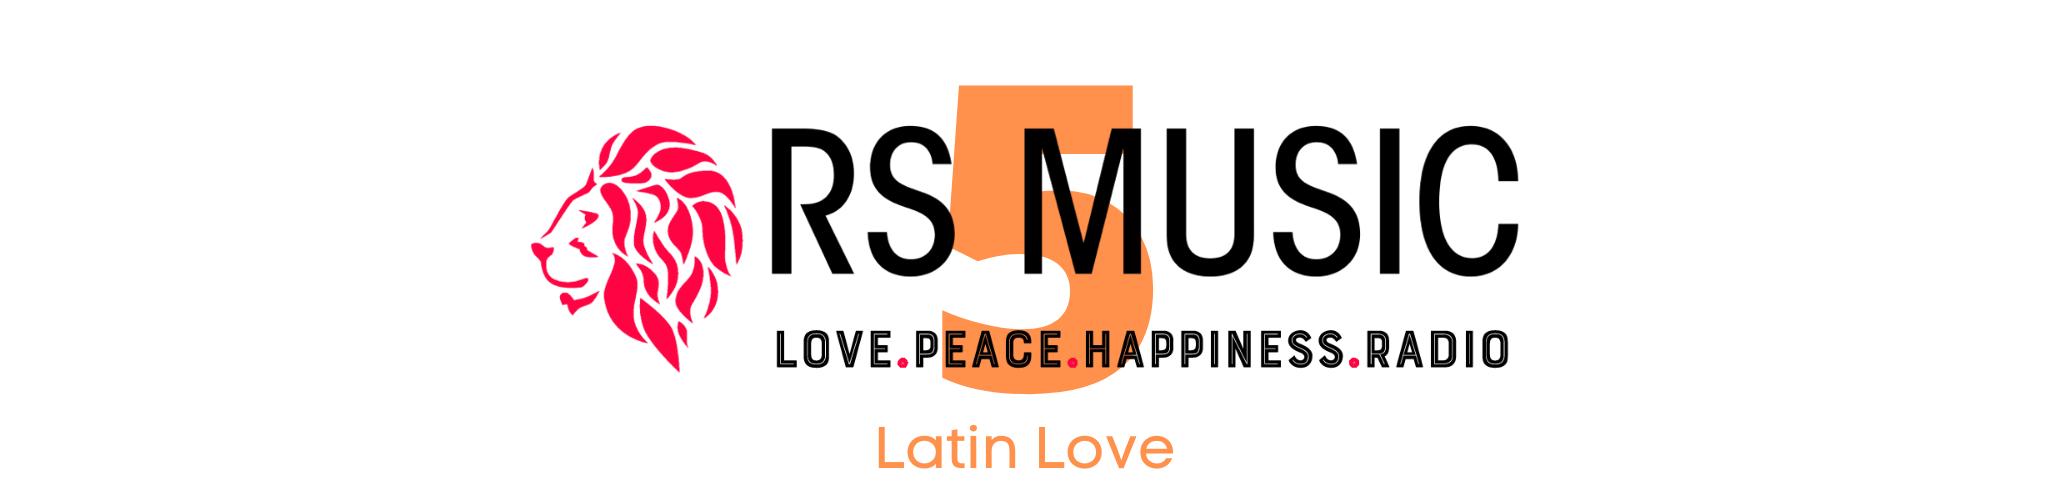 RSMUSIC 5 Amor Latino, Latin Love. Radio Latin Musik